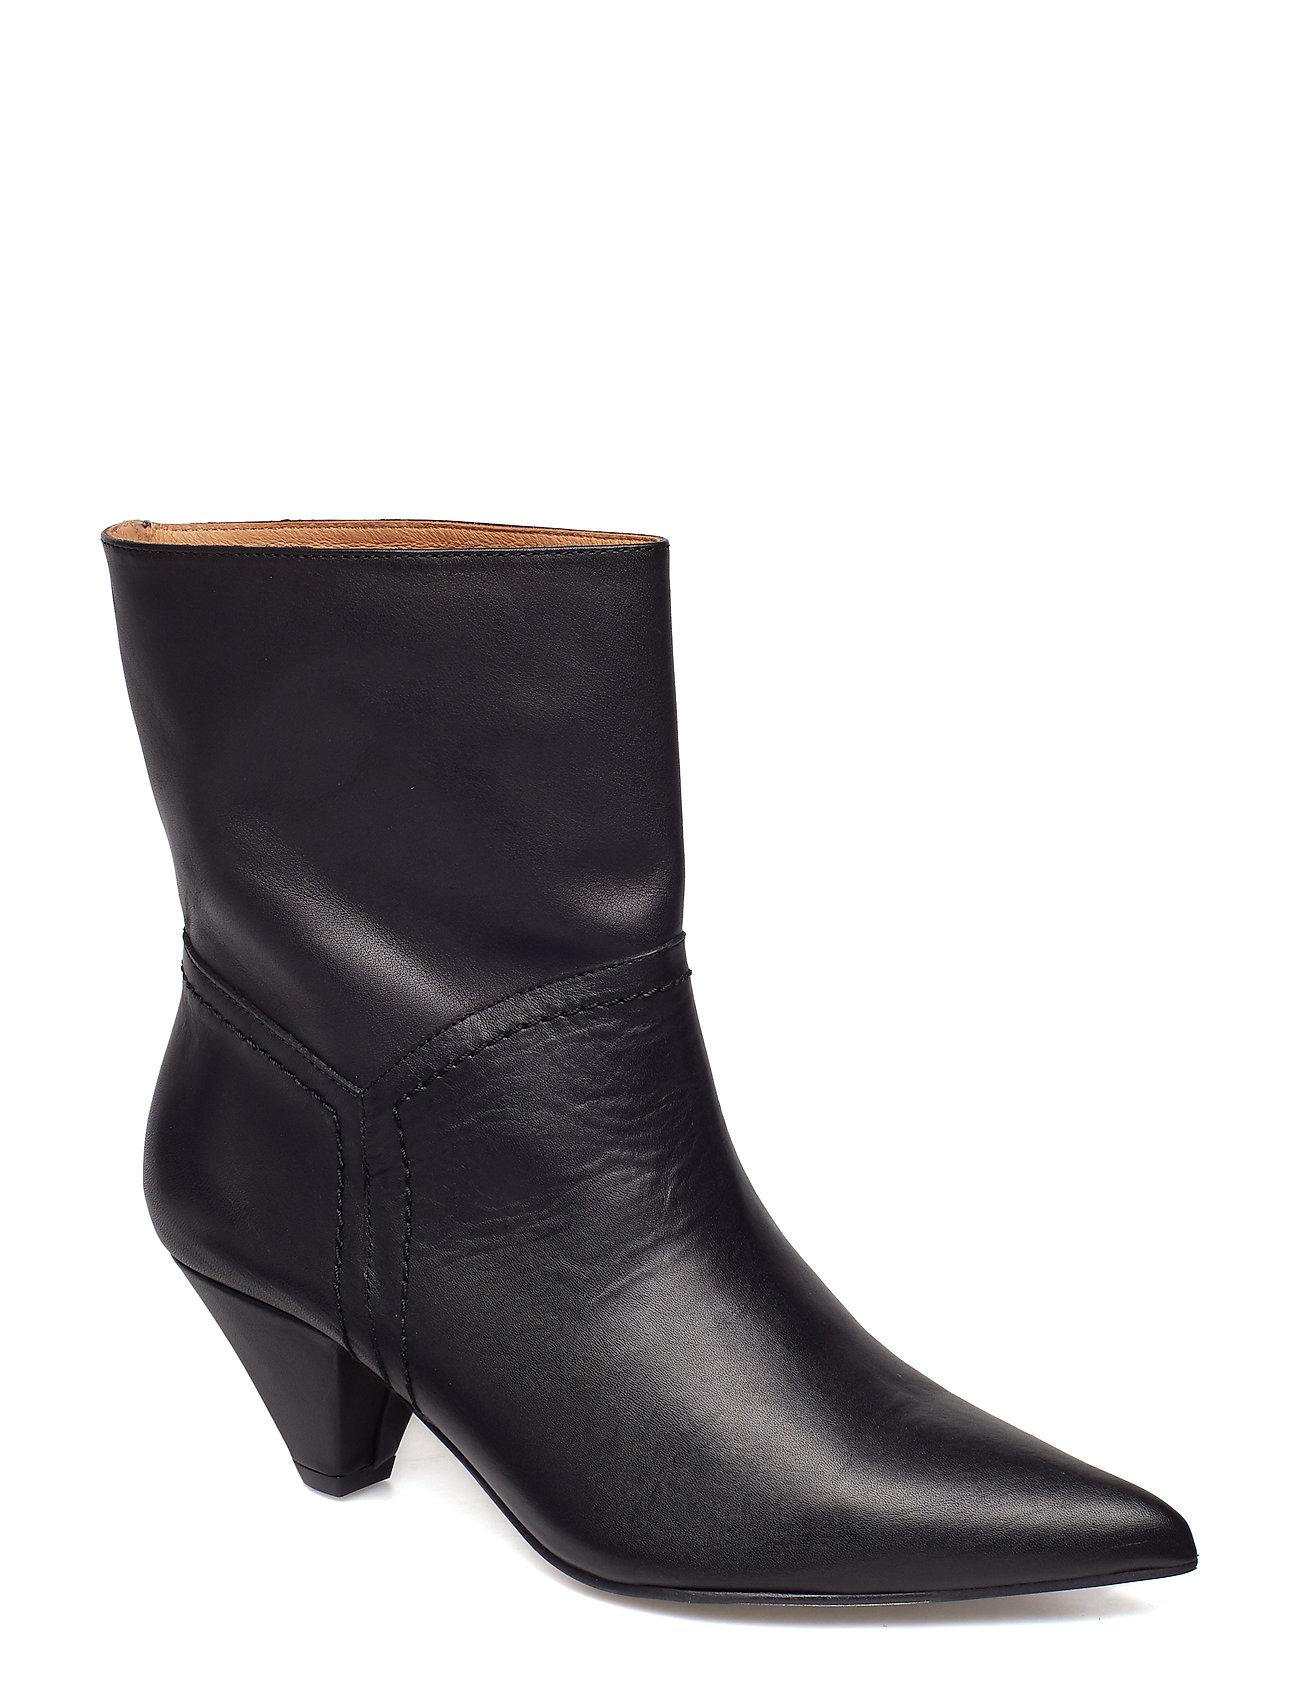 14edfb0d216 Henry Kole ankelstøvler – Selena til dame i Sort - Pashion.dk